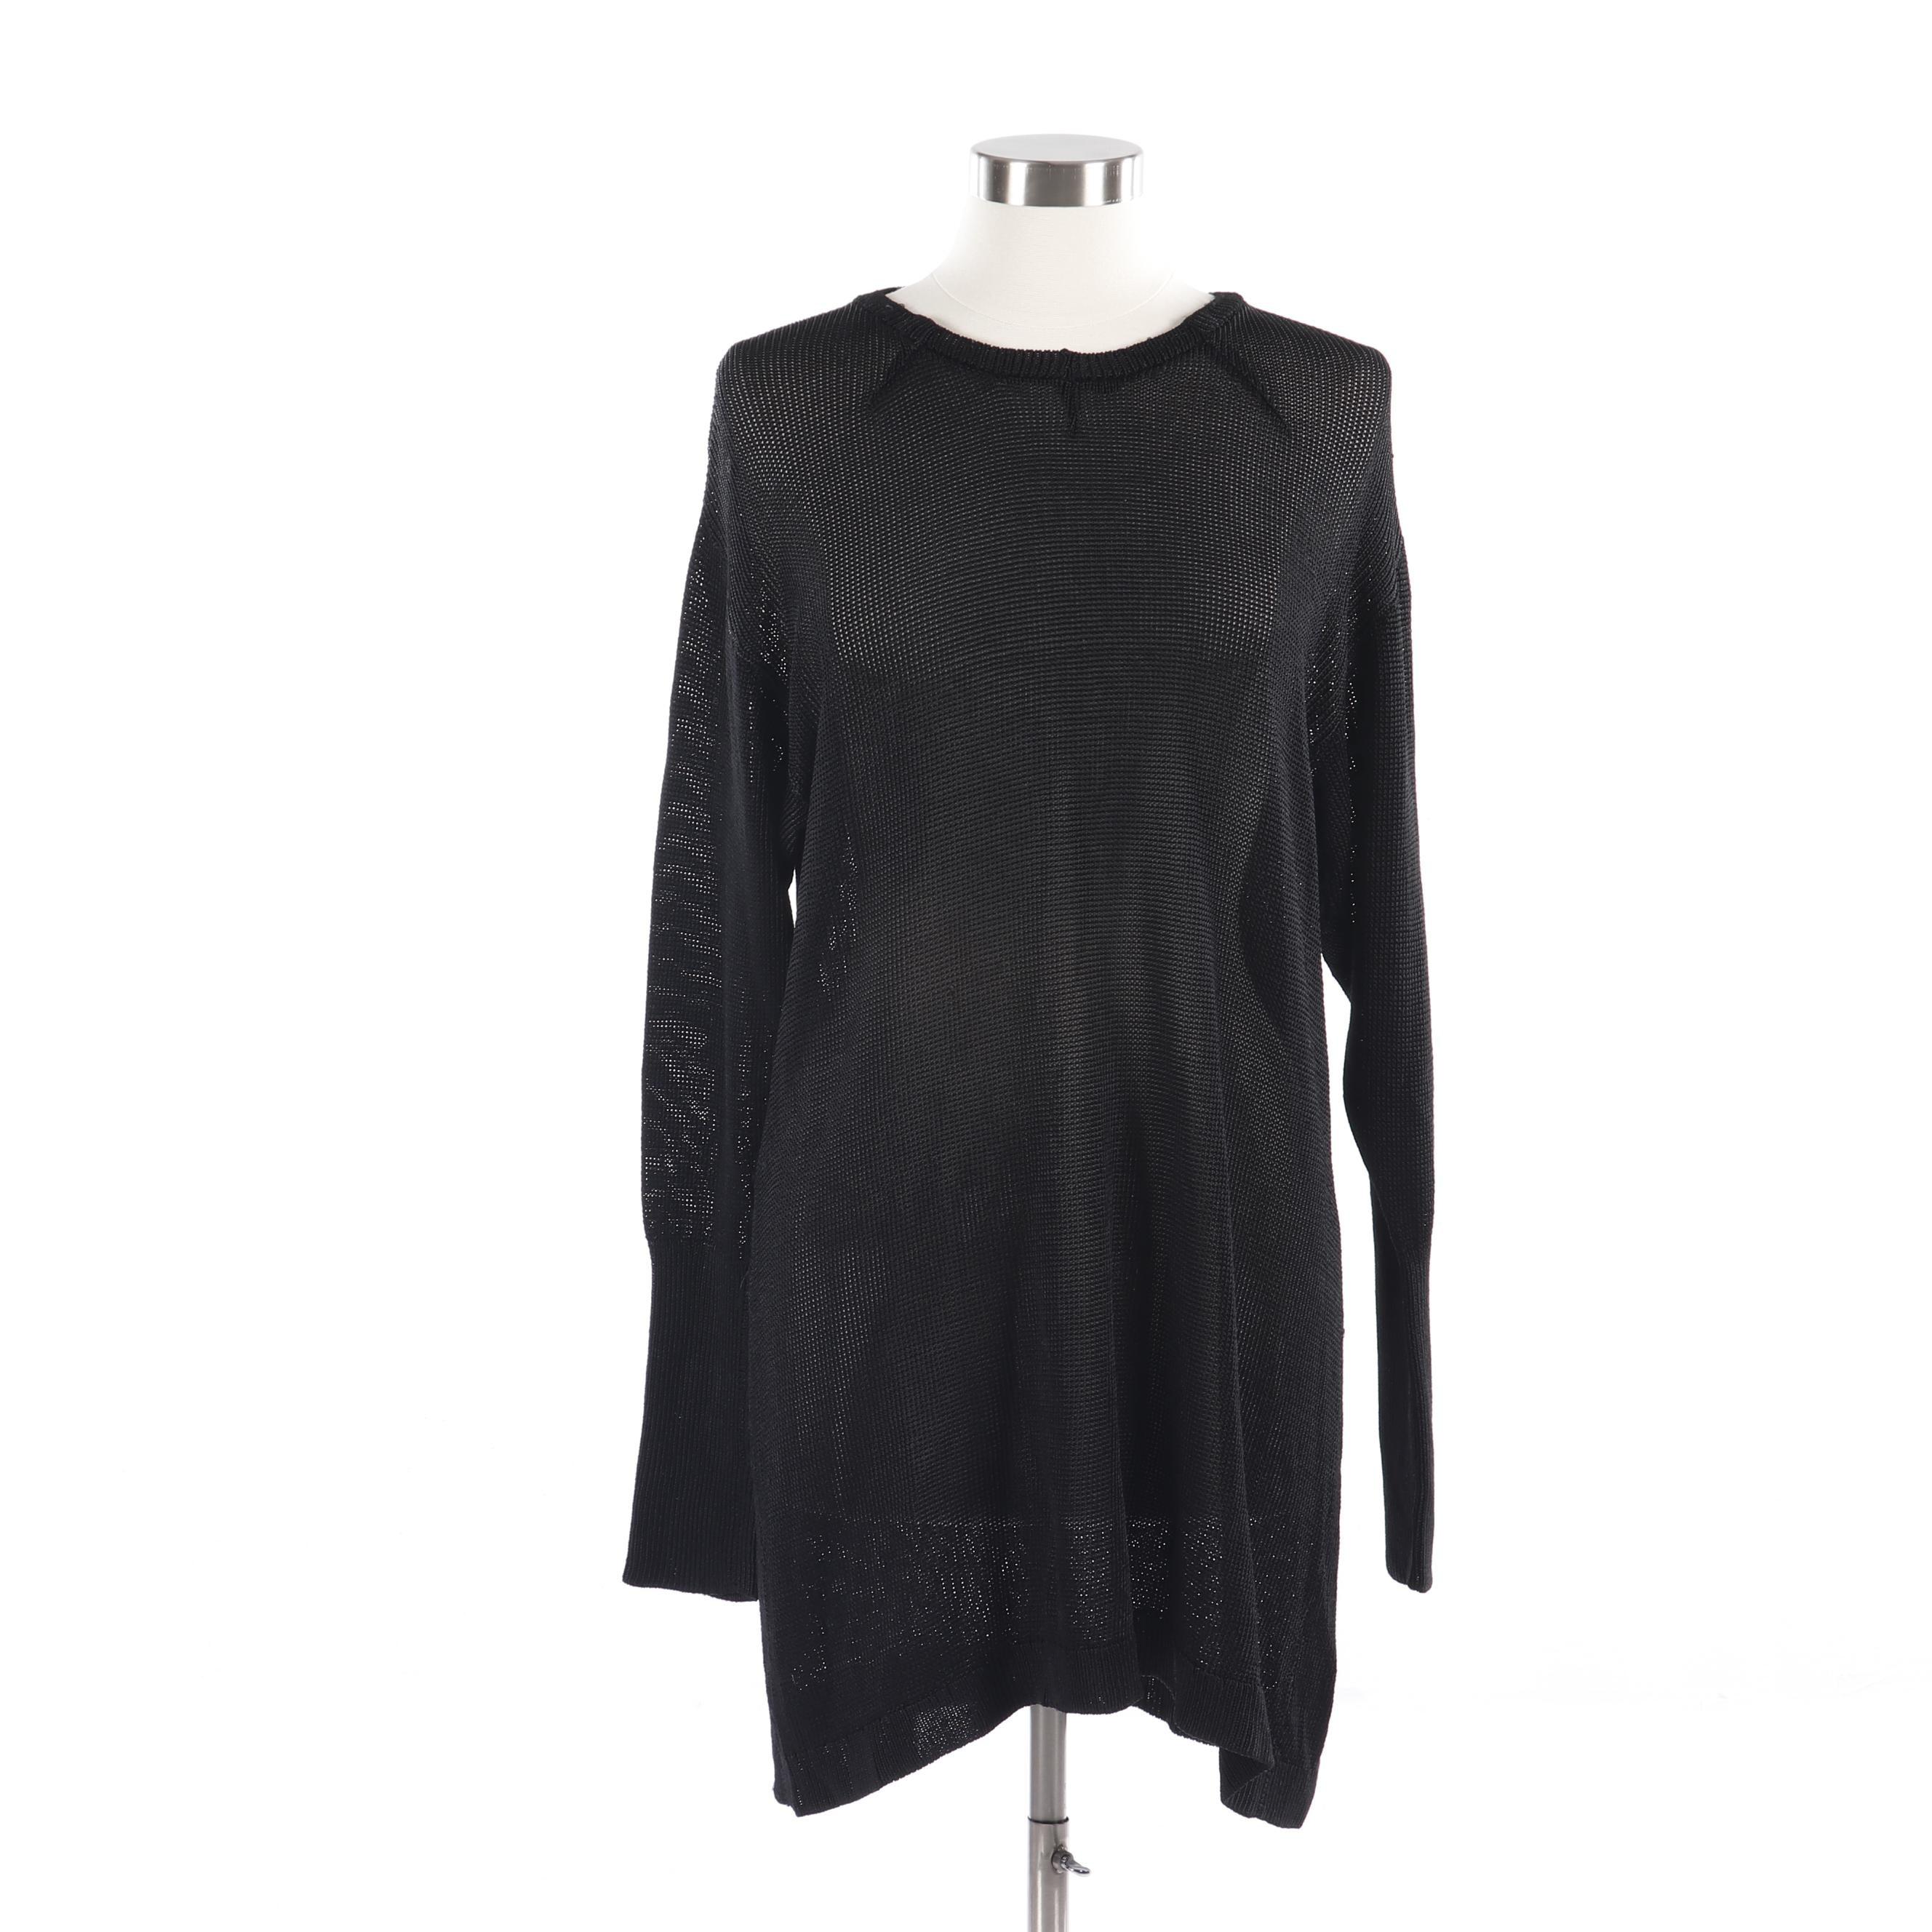 Women's Black Knit Tunic Style Long Sleeve Top